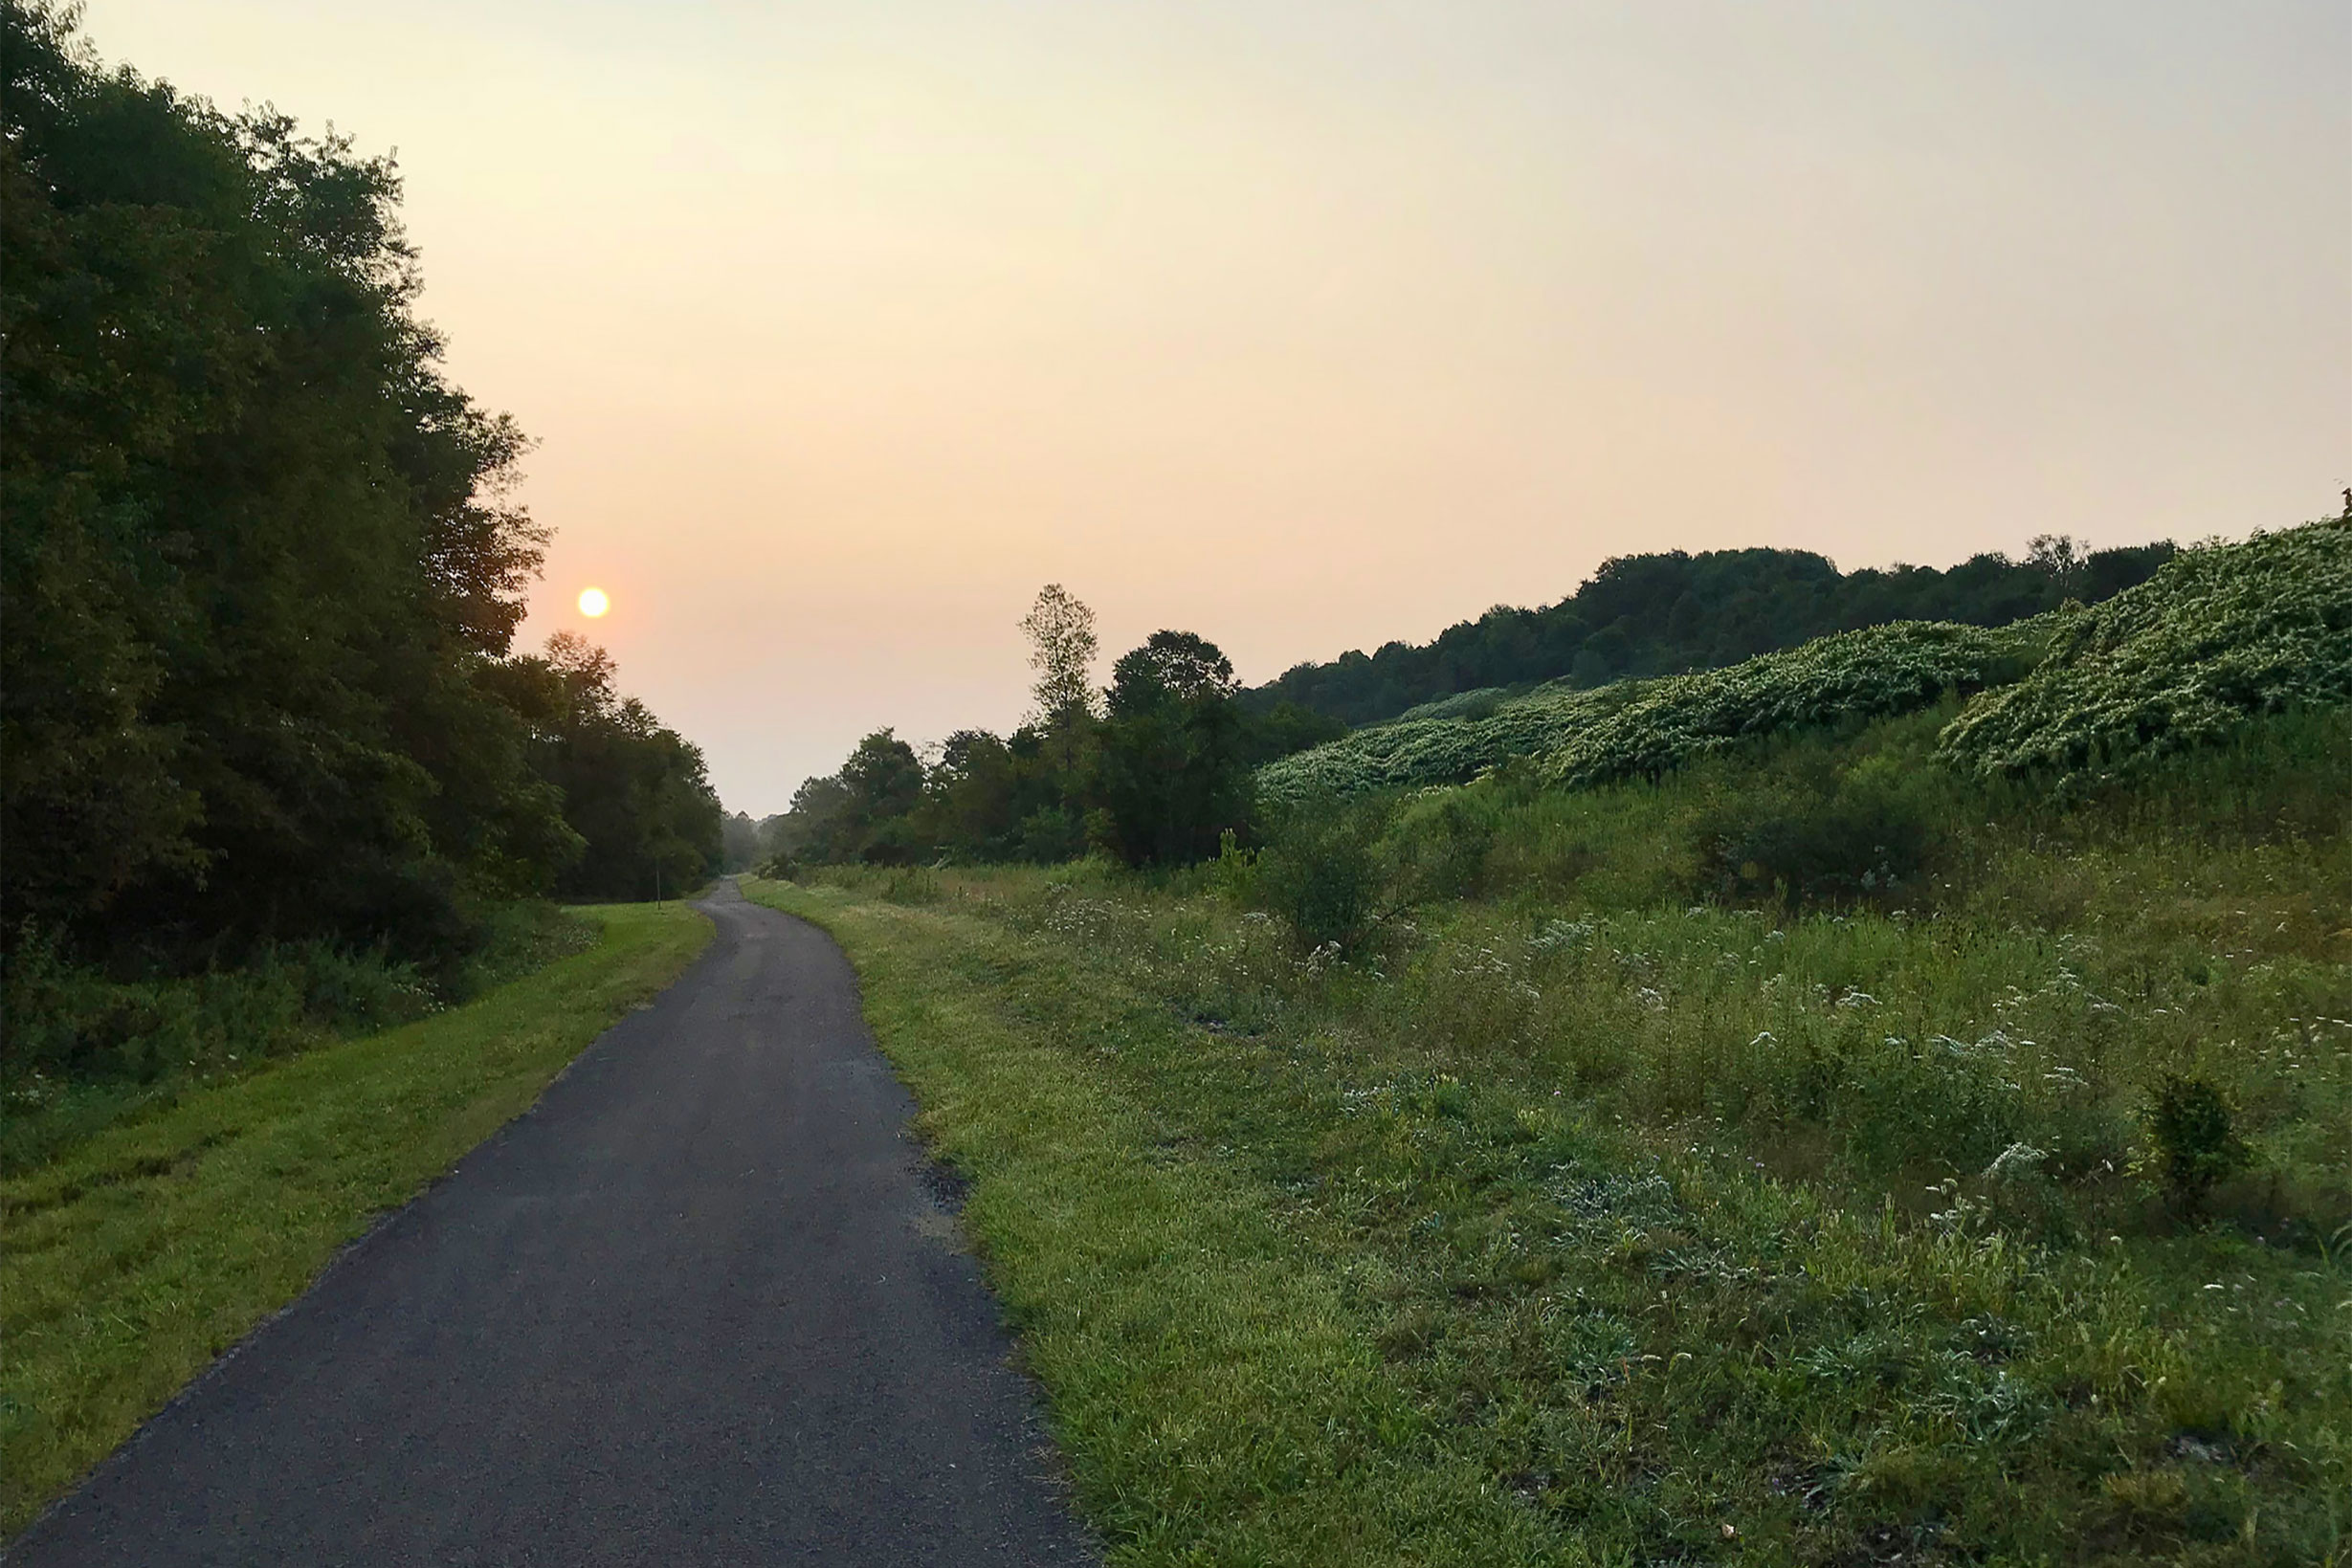 Panhandle Trail bike path sunset